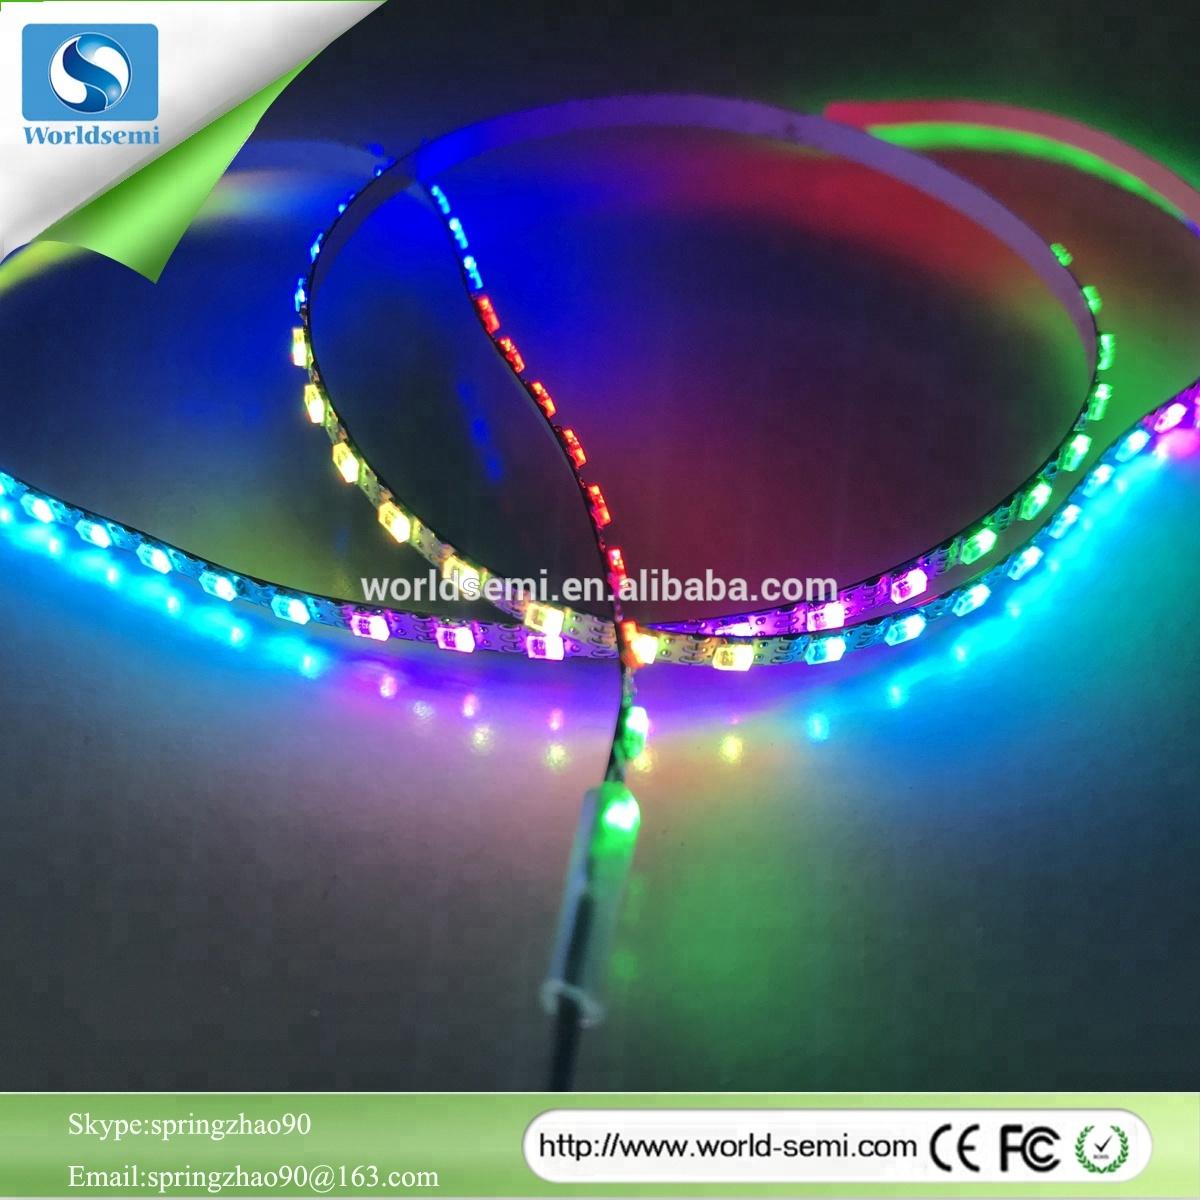 LED WS-2812C RGB 5050